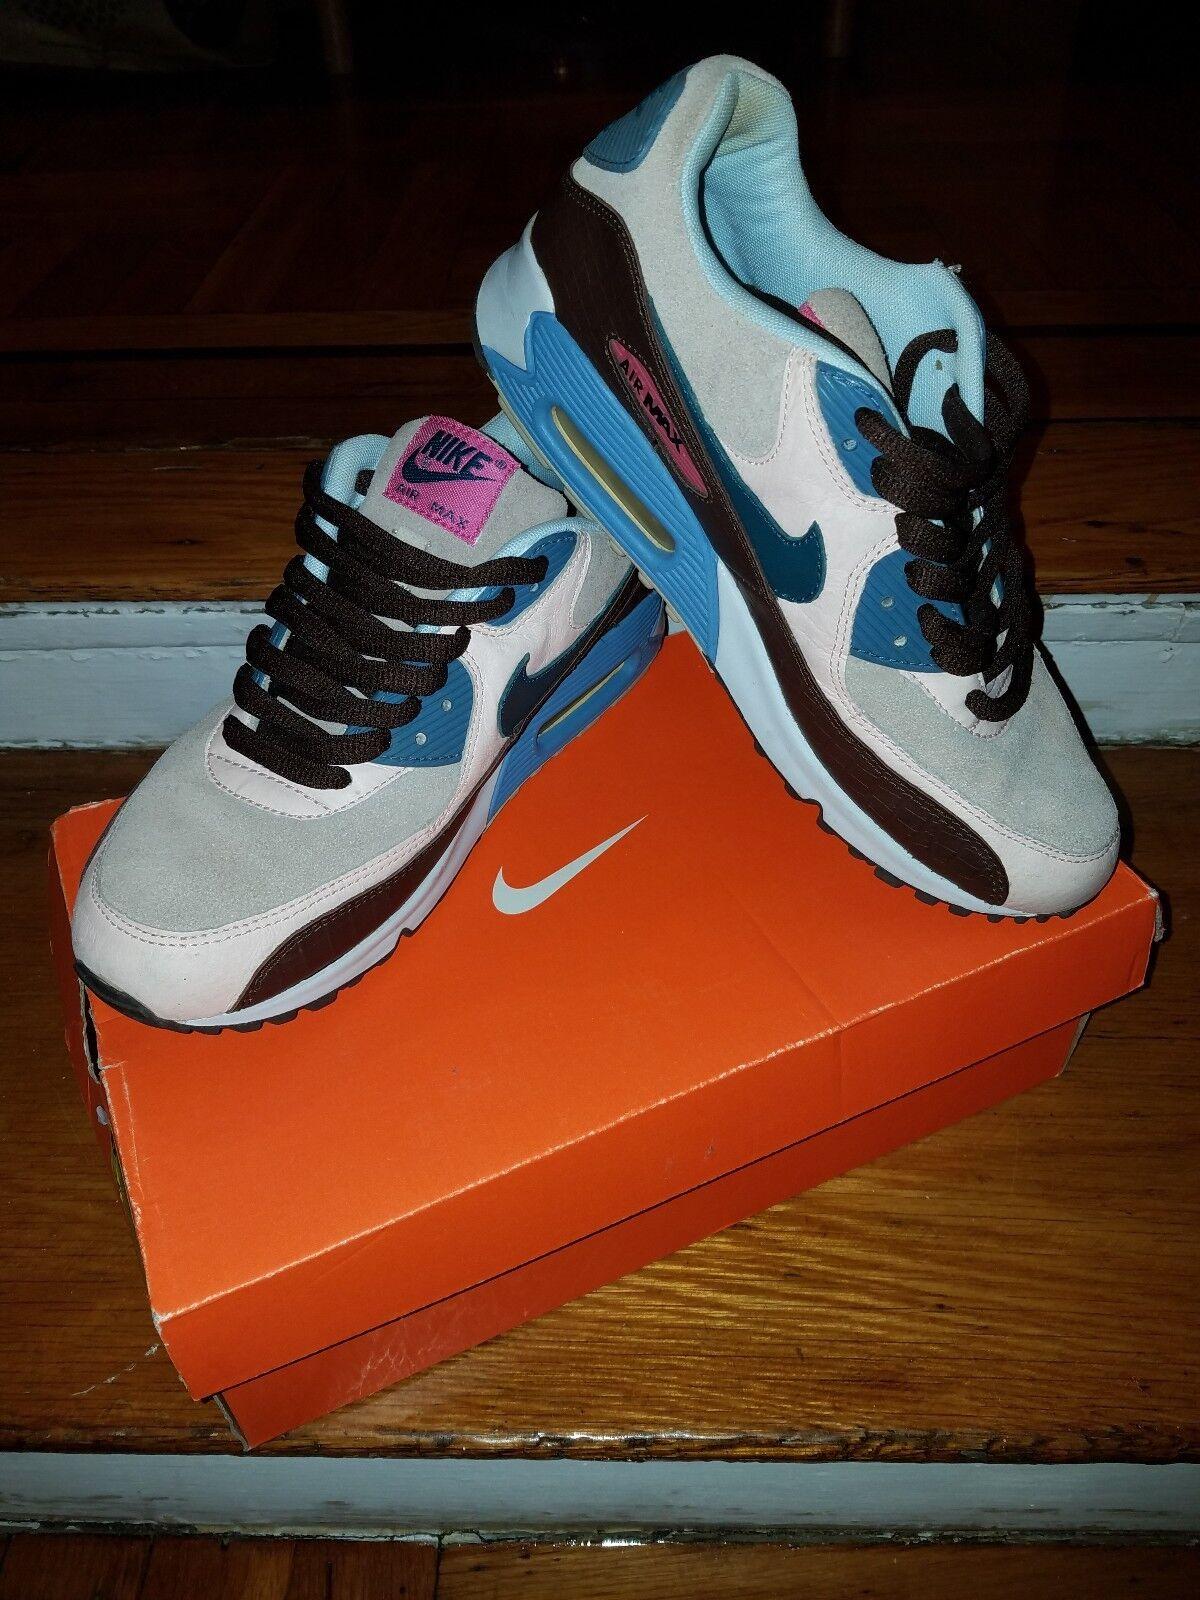 Nike airmax 90 premium selten